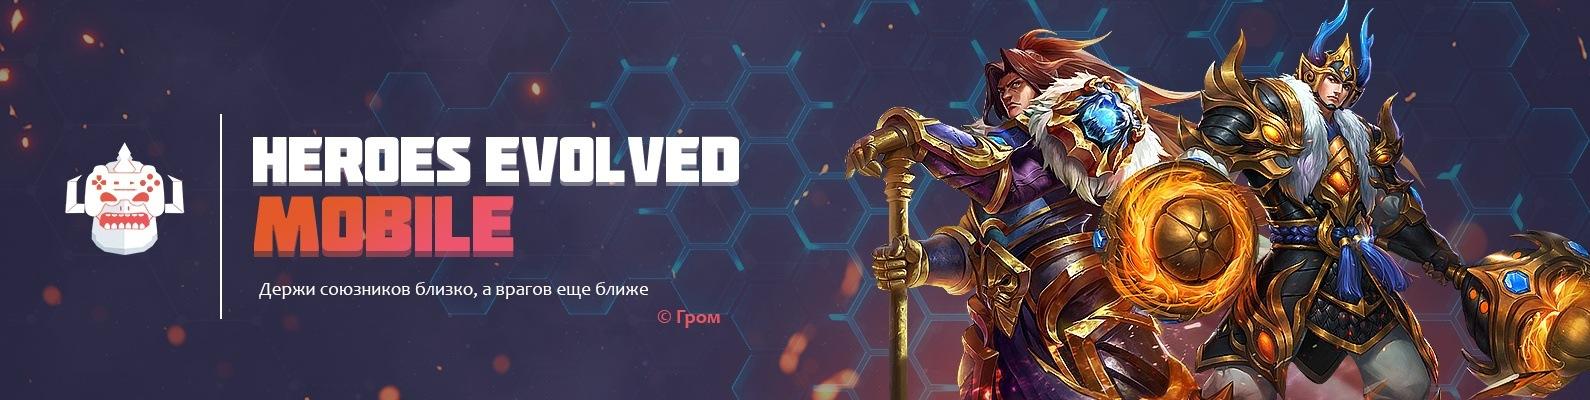 Heroes Evolved Mobile | ВКонтакте